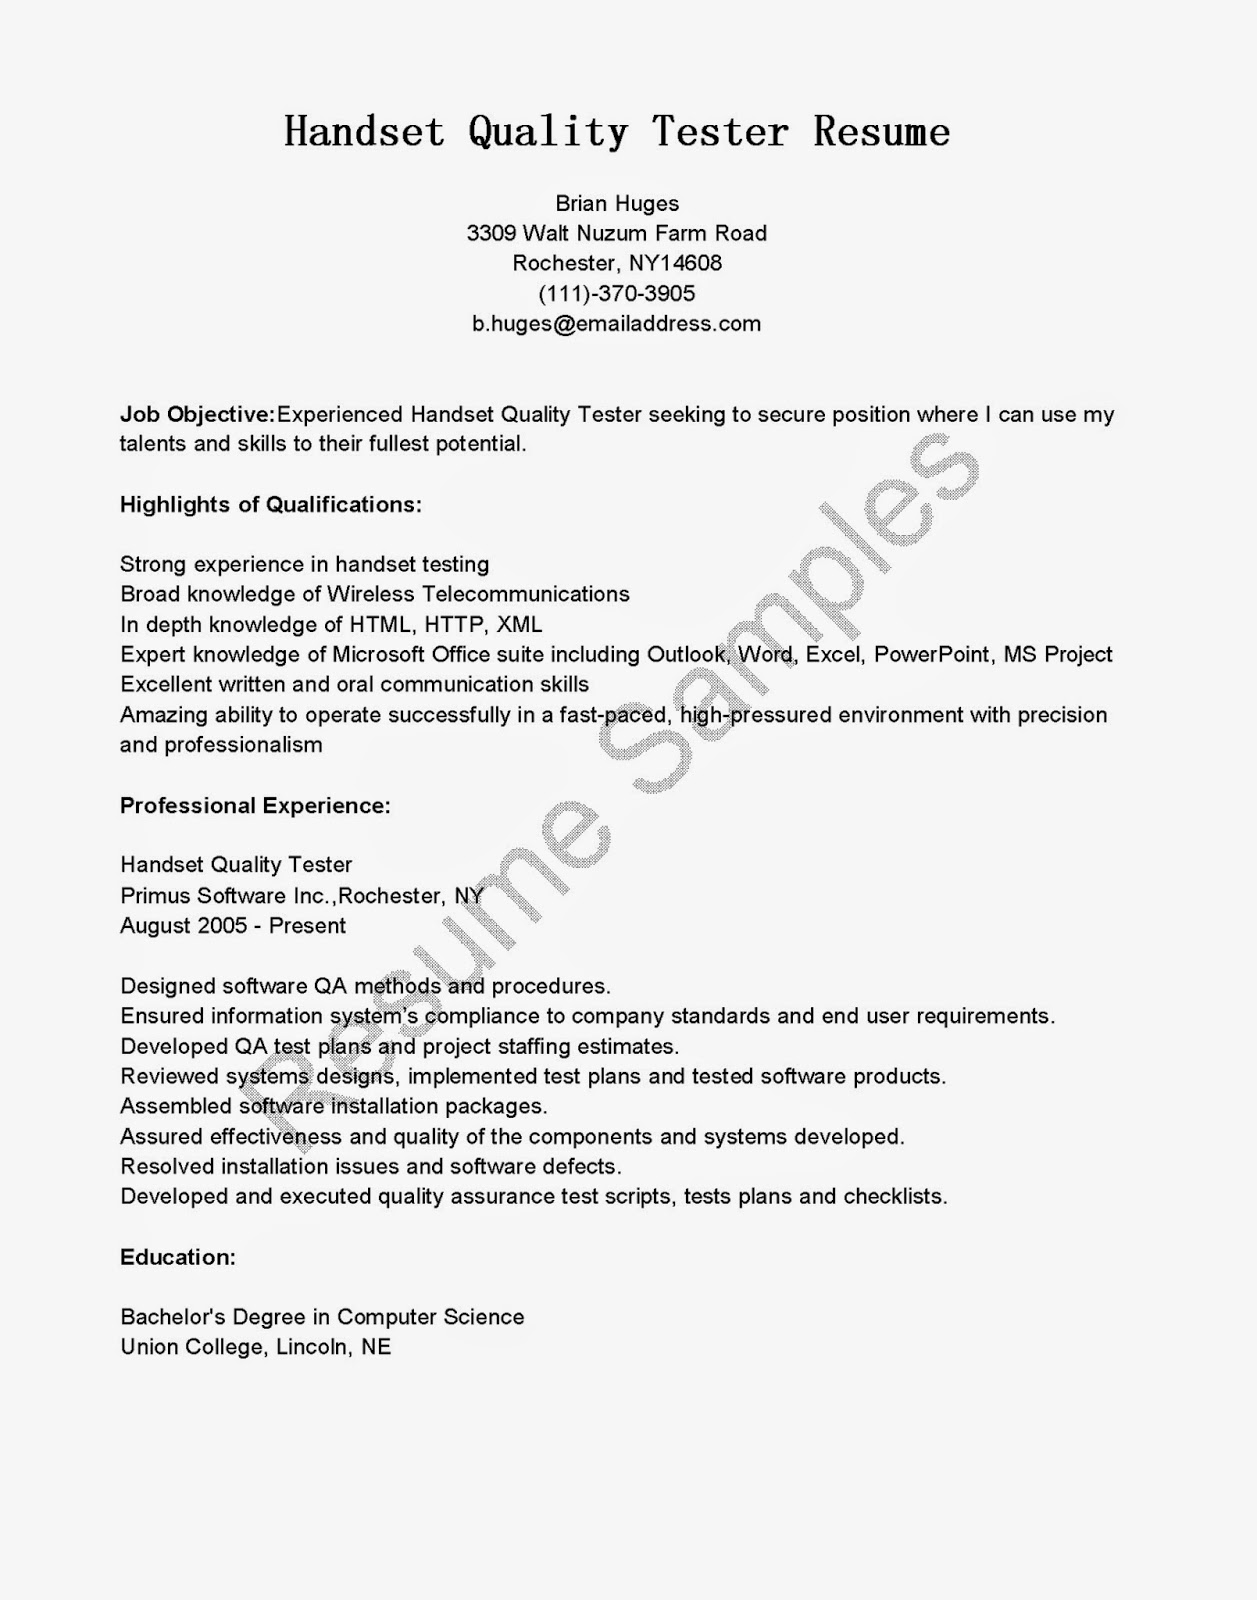 Resume Samples Handset Quality Tester Sample Cover Letter For Assurance Analyst Position